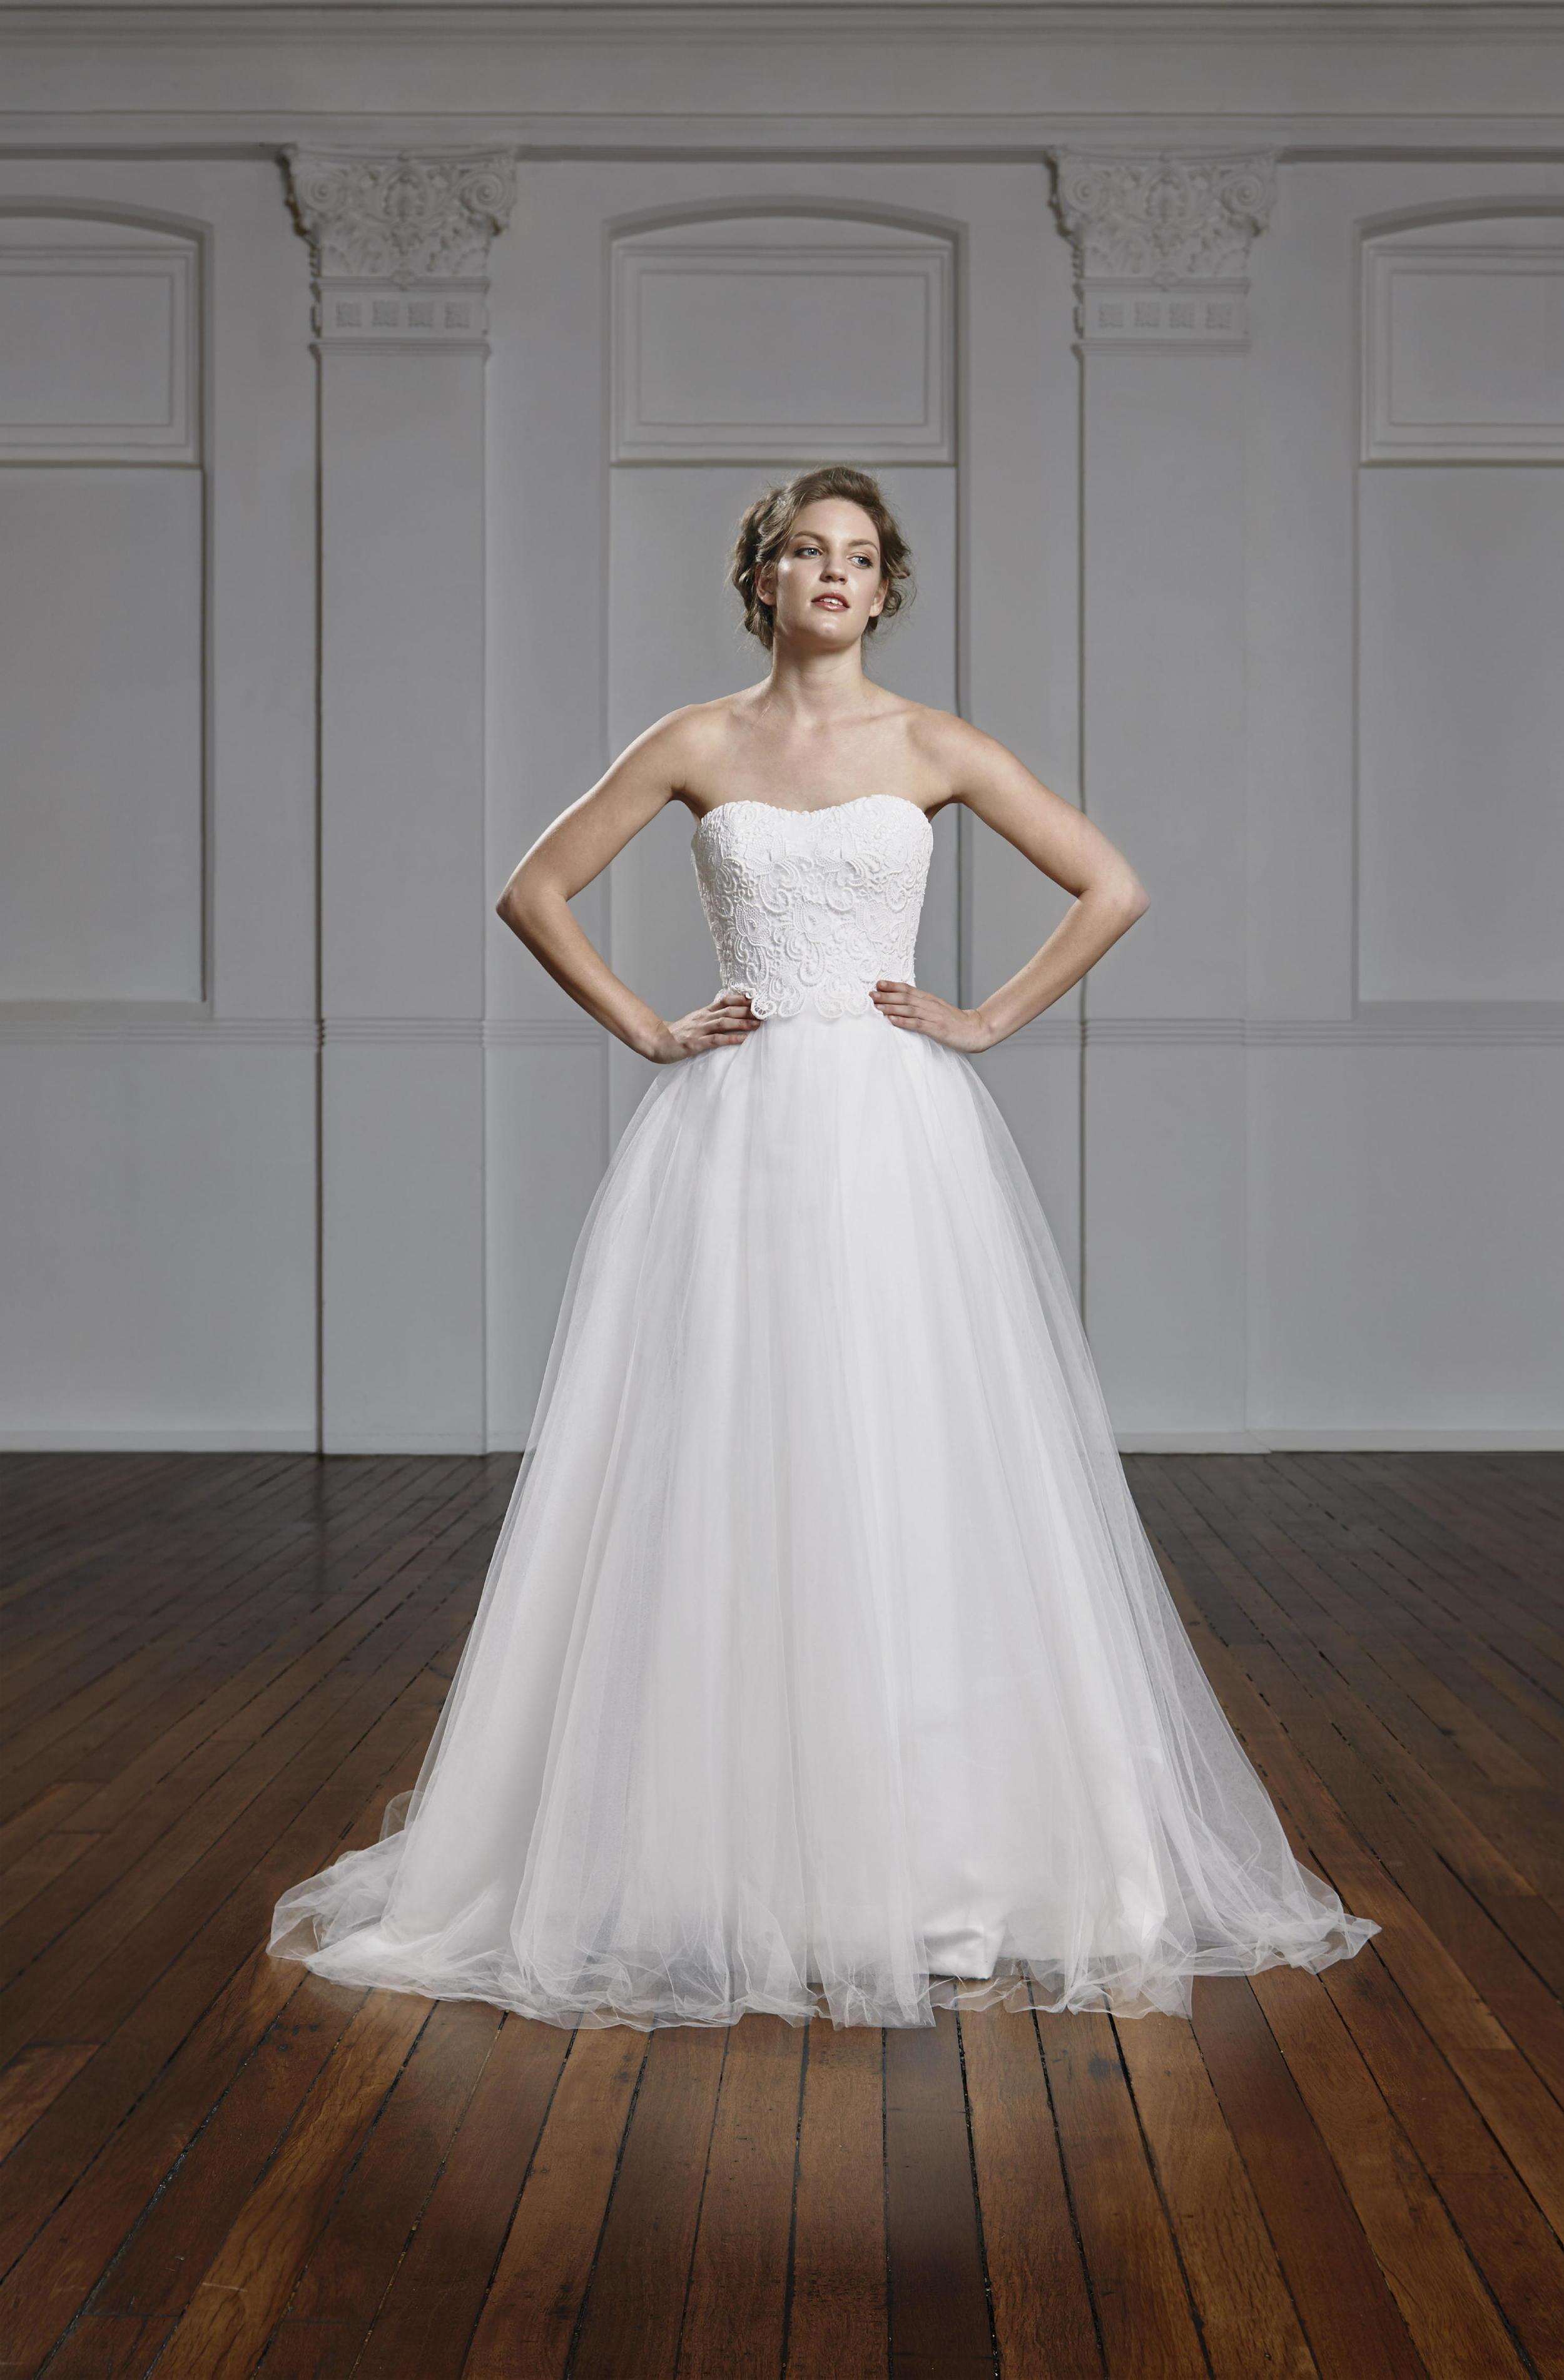 Rose-bridal design_TanyaAnic Grant Sparkes Carroll_188_a sydney bridal (1).jpg